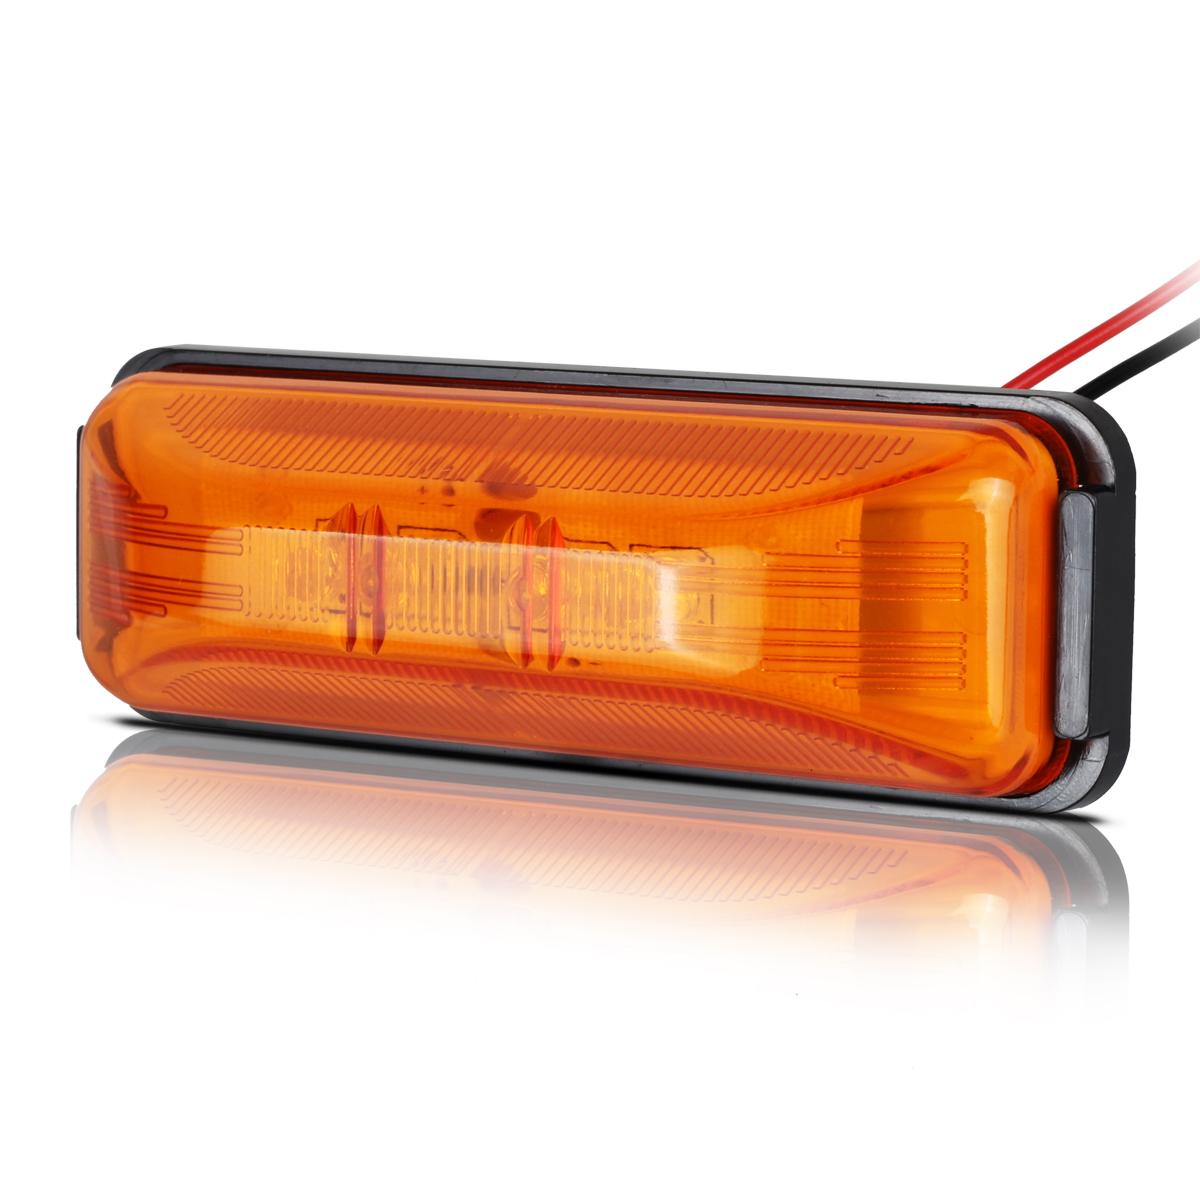 "(2) 3.8""Amber Side Marker Clearance 4Diode Light Trailer"